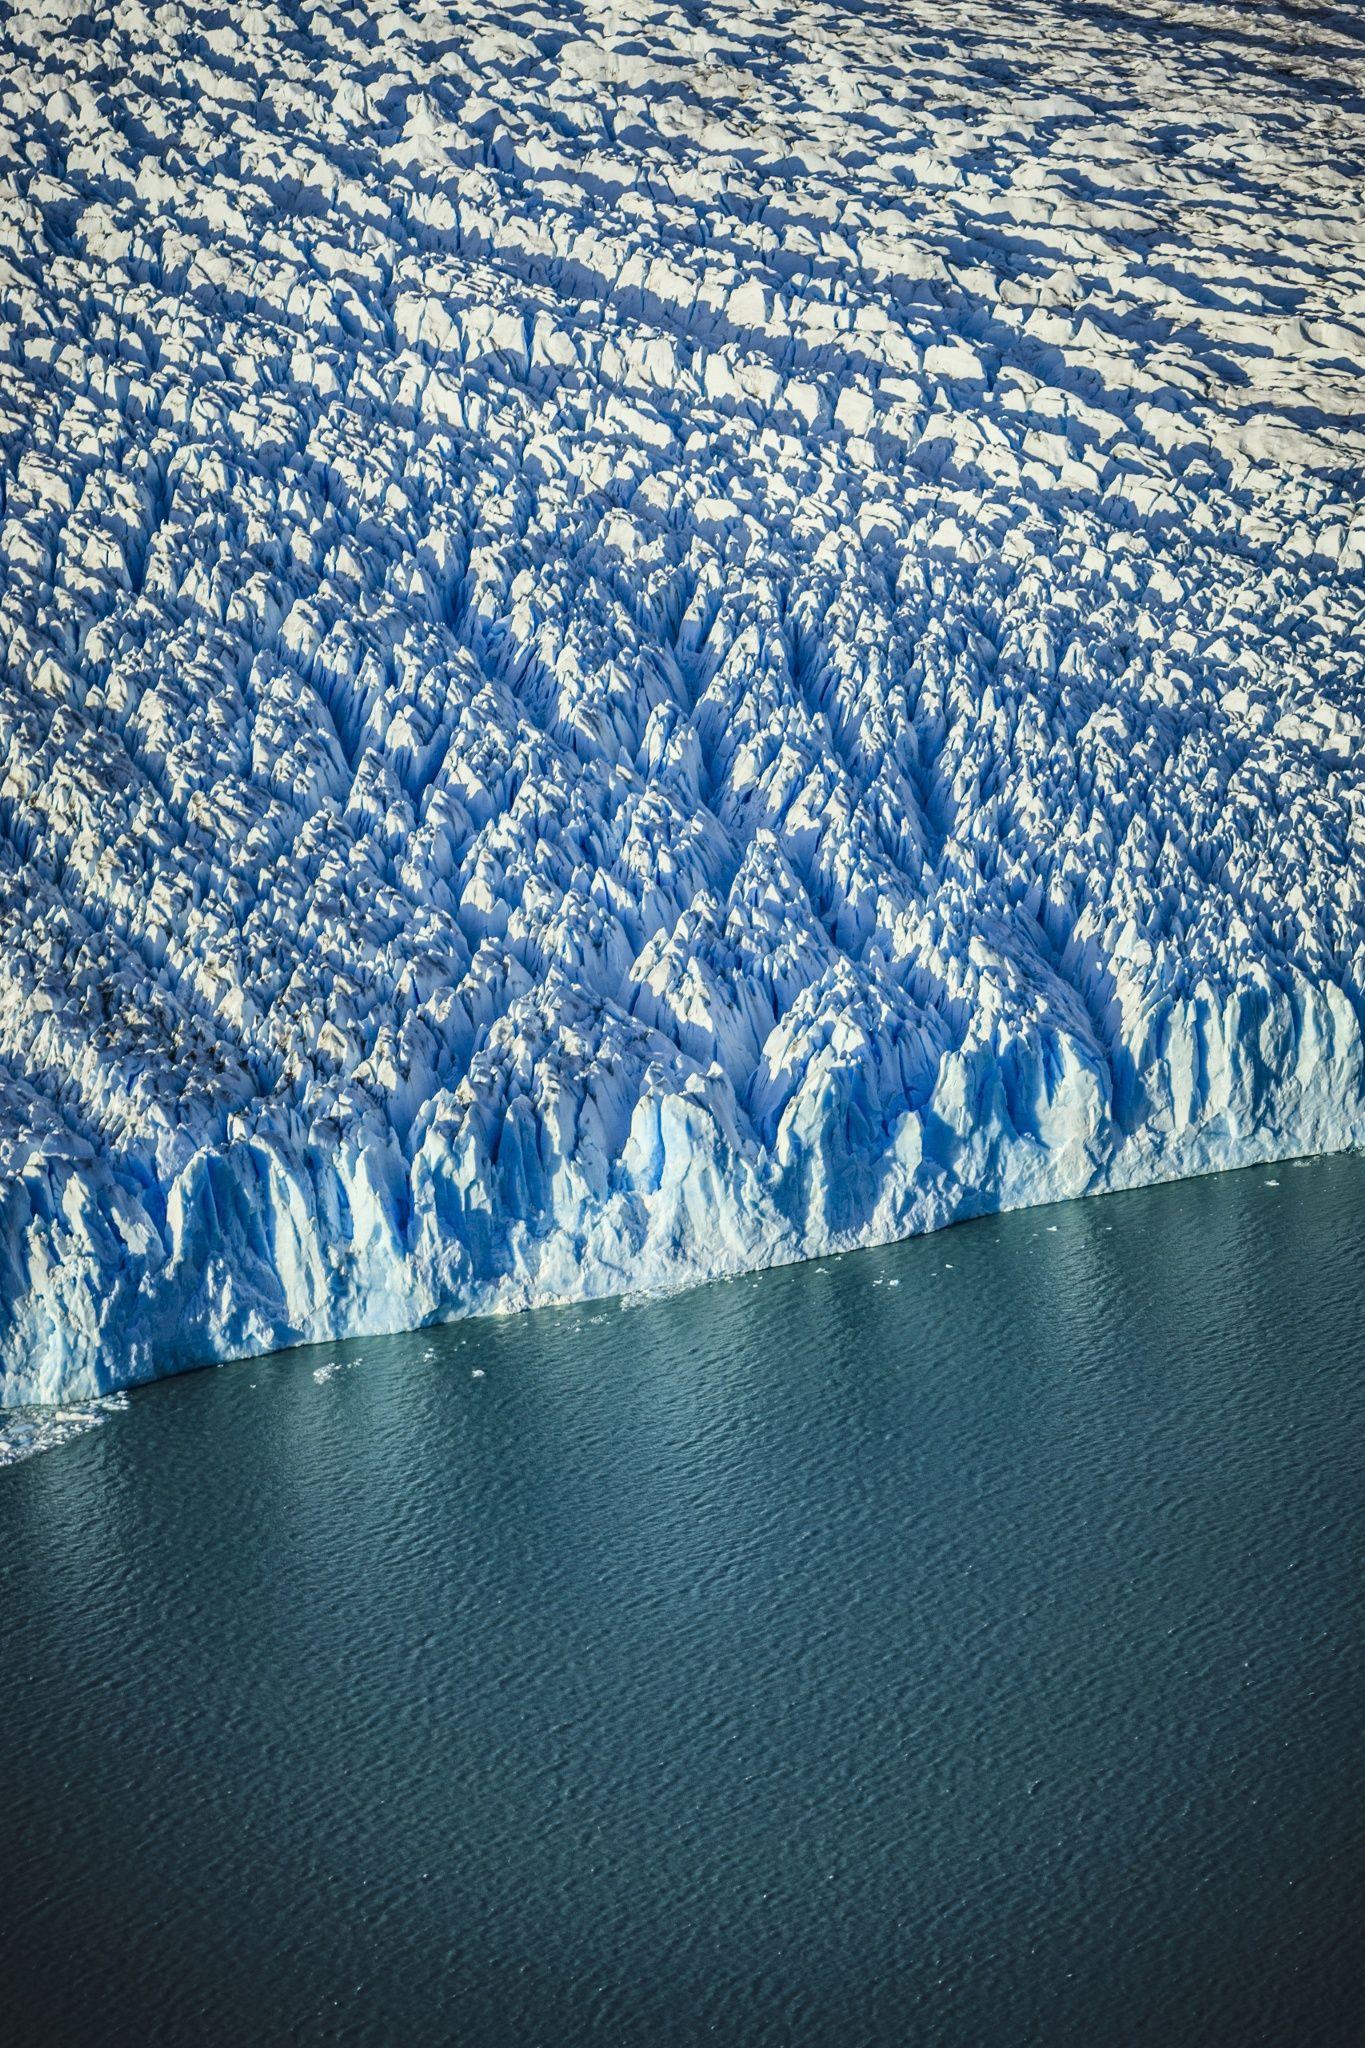 Aerial view of glacier's edge and water in El Calafate, Patagonia, Argentina